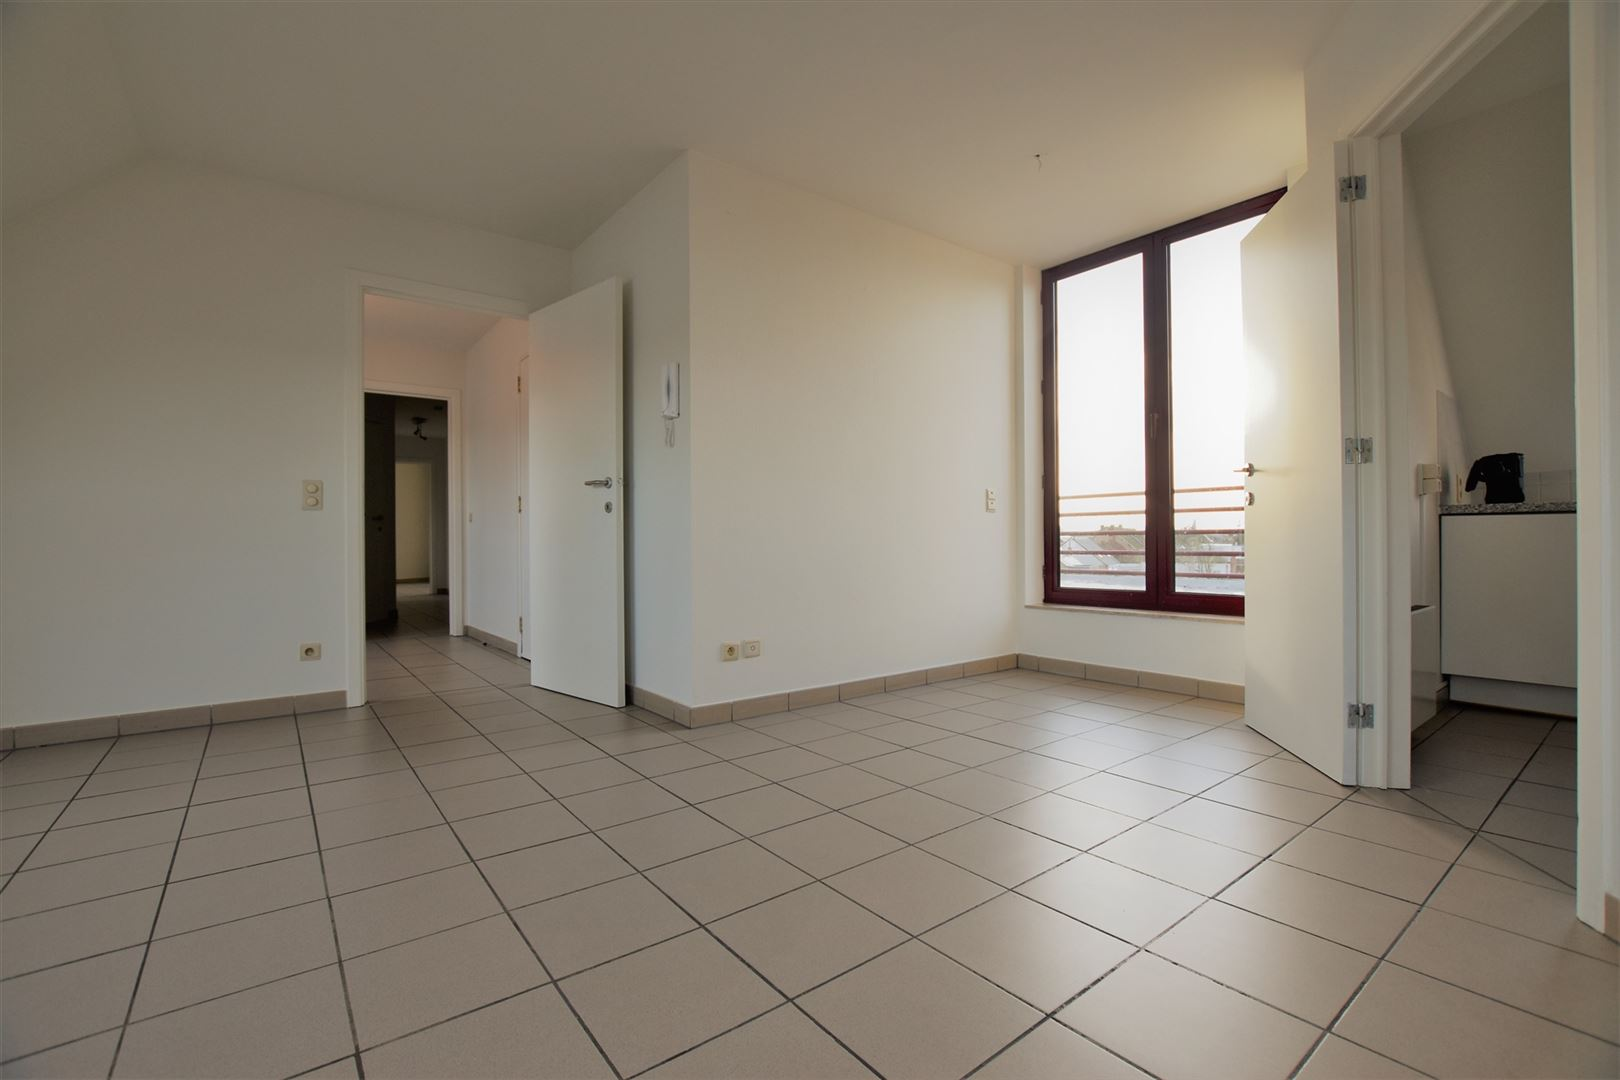 Foto 9 : Appartement te 9280 Lebbeke (België) - Prijs € 645